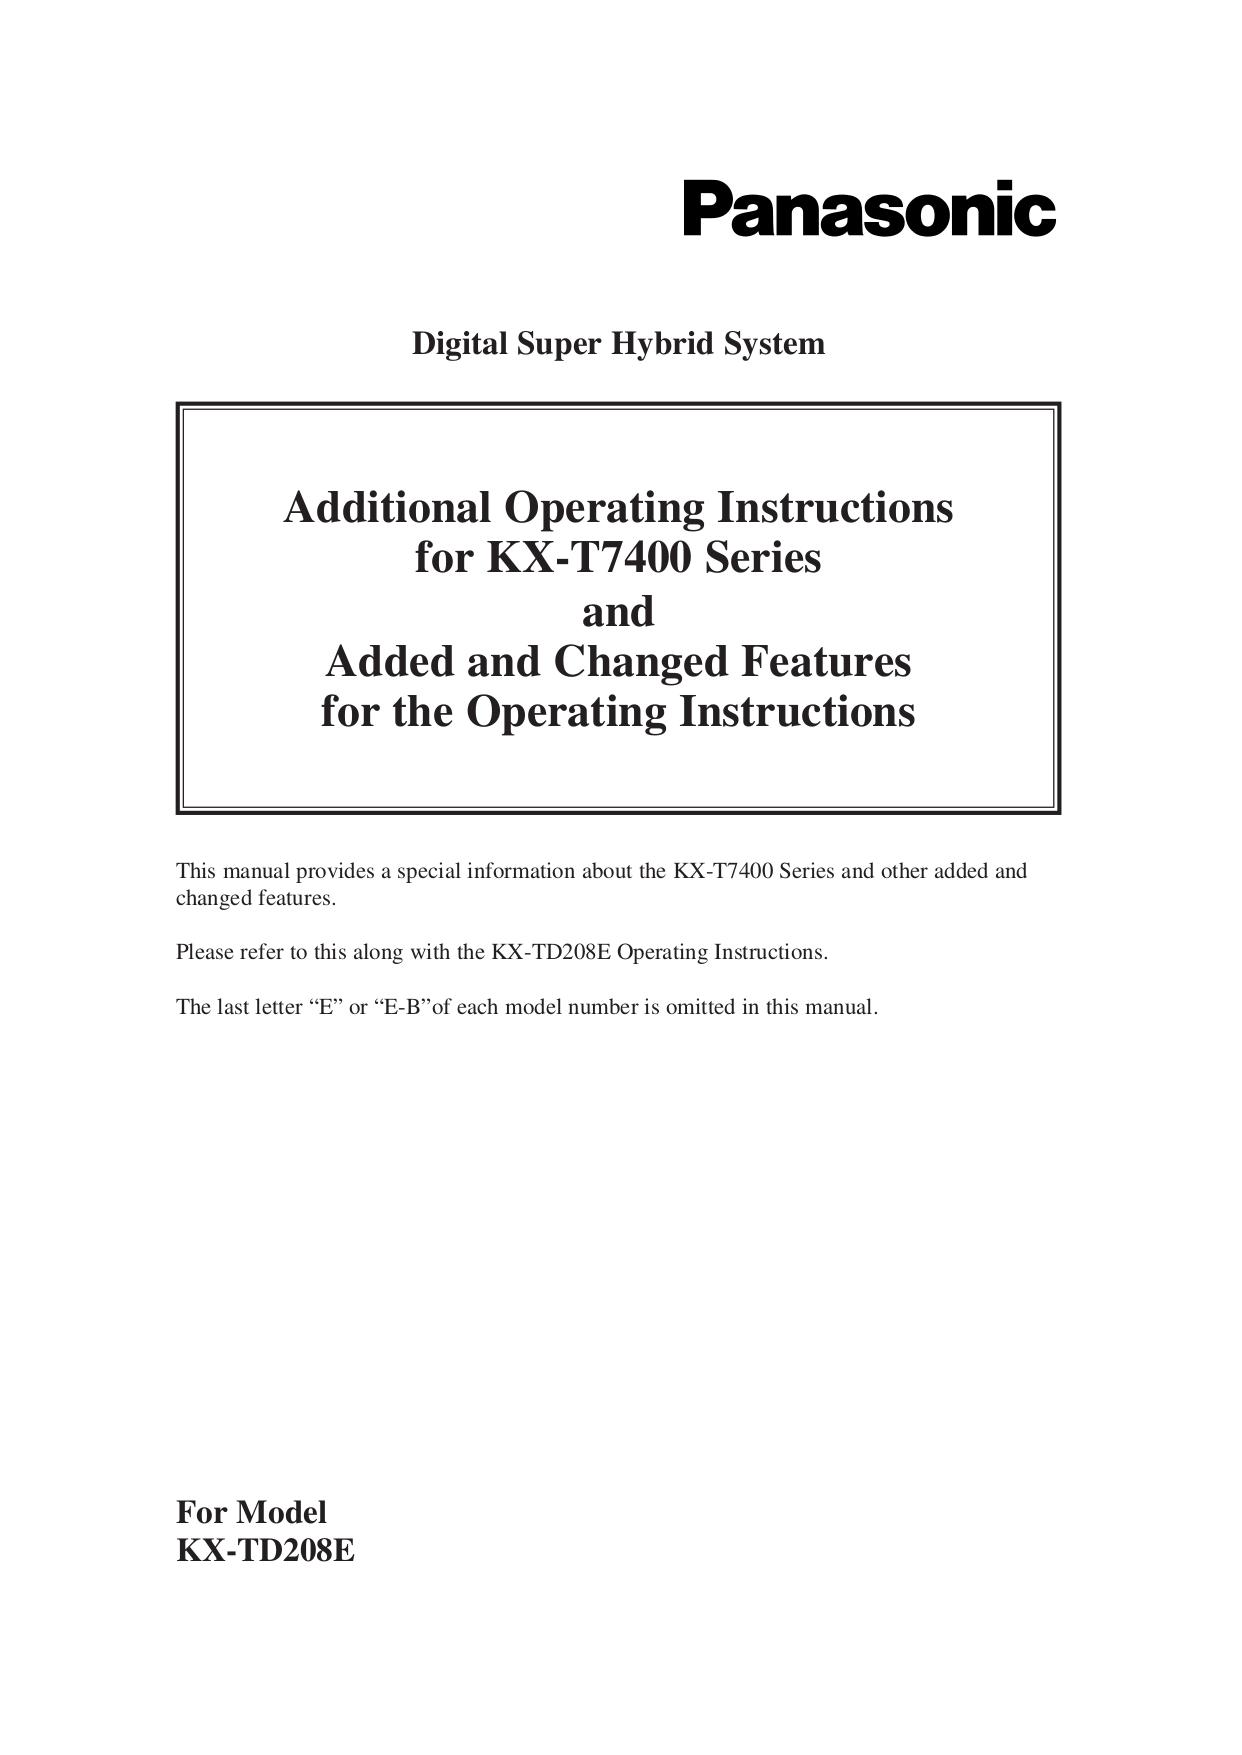 download free pdf for panasonic kx t7667 telephone manual rh umlib com Panasonic Kx Instruction Manual 4021 Panasonic Kx E4000 Manual